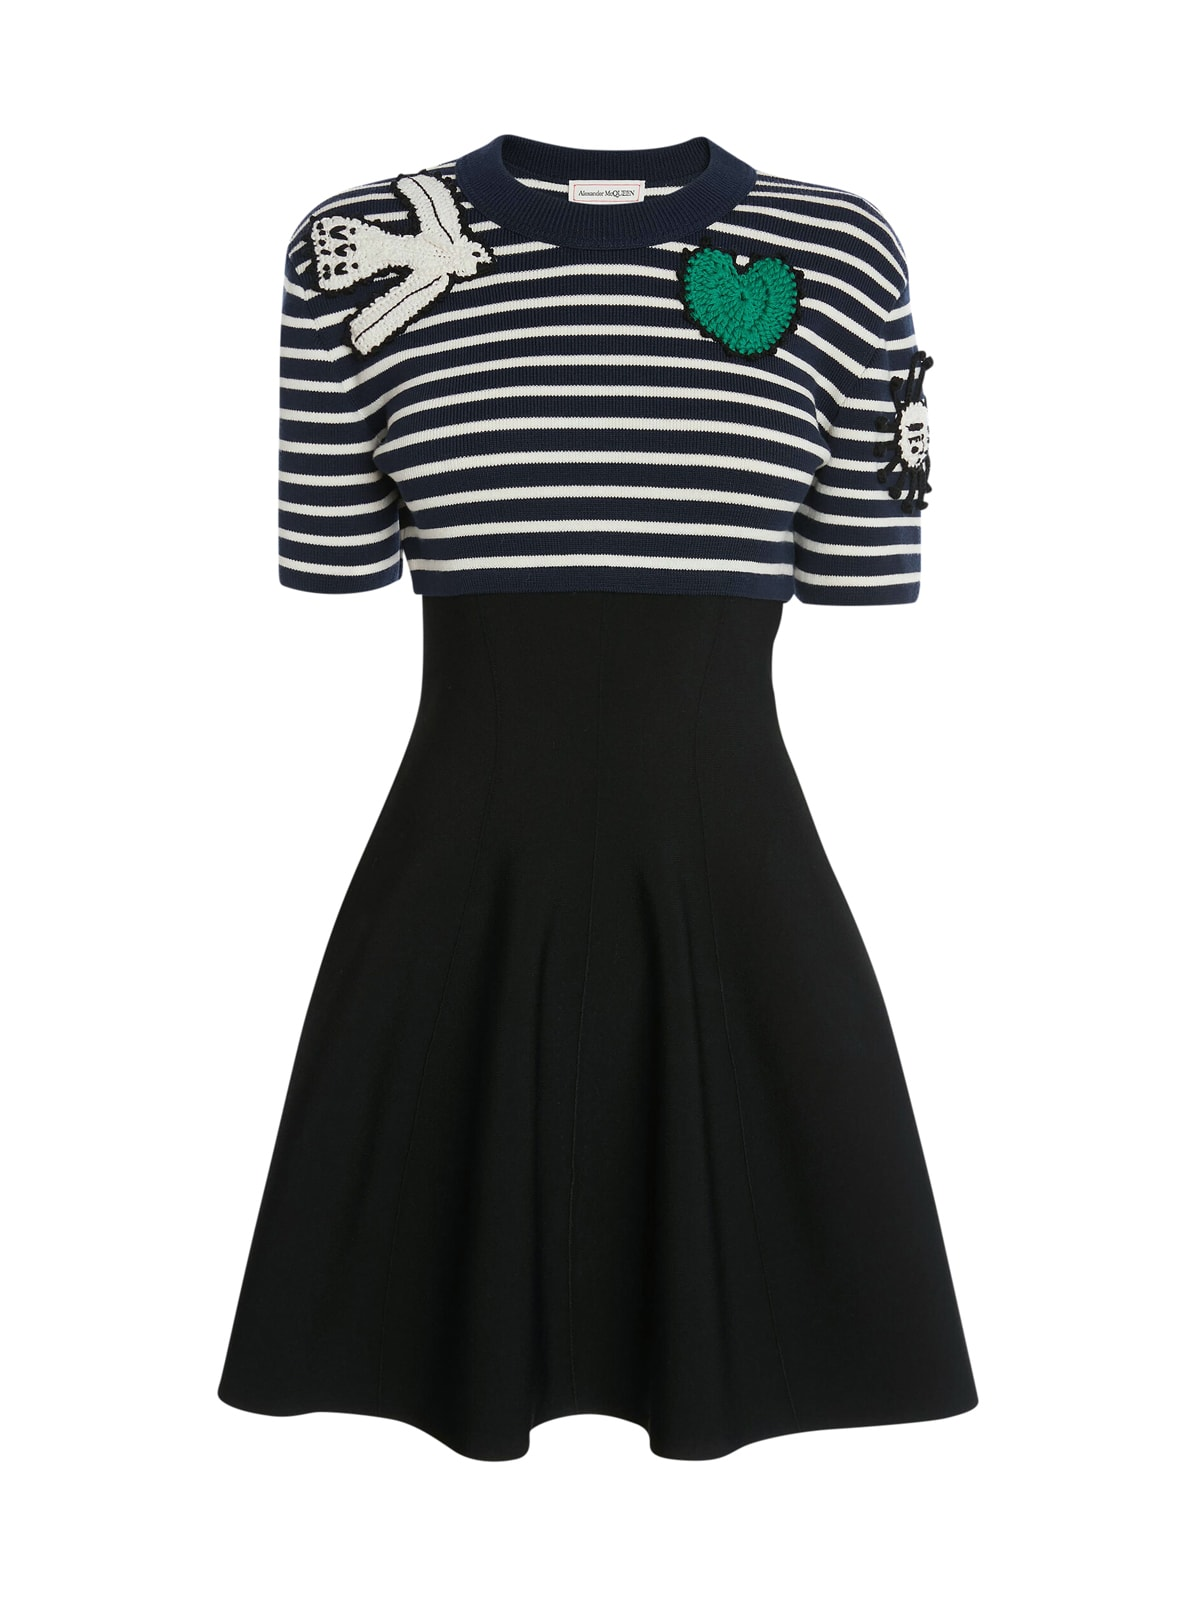 Buy Alexander McQueen Crochet Patches Knit Mini Dress online, shop Alexander McQueen with free shipping